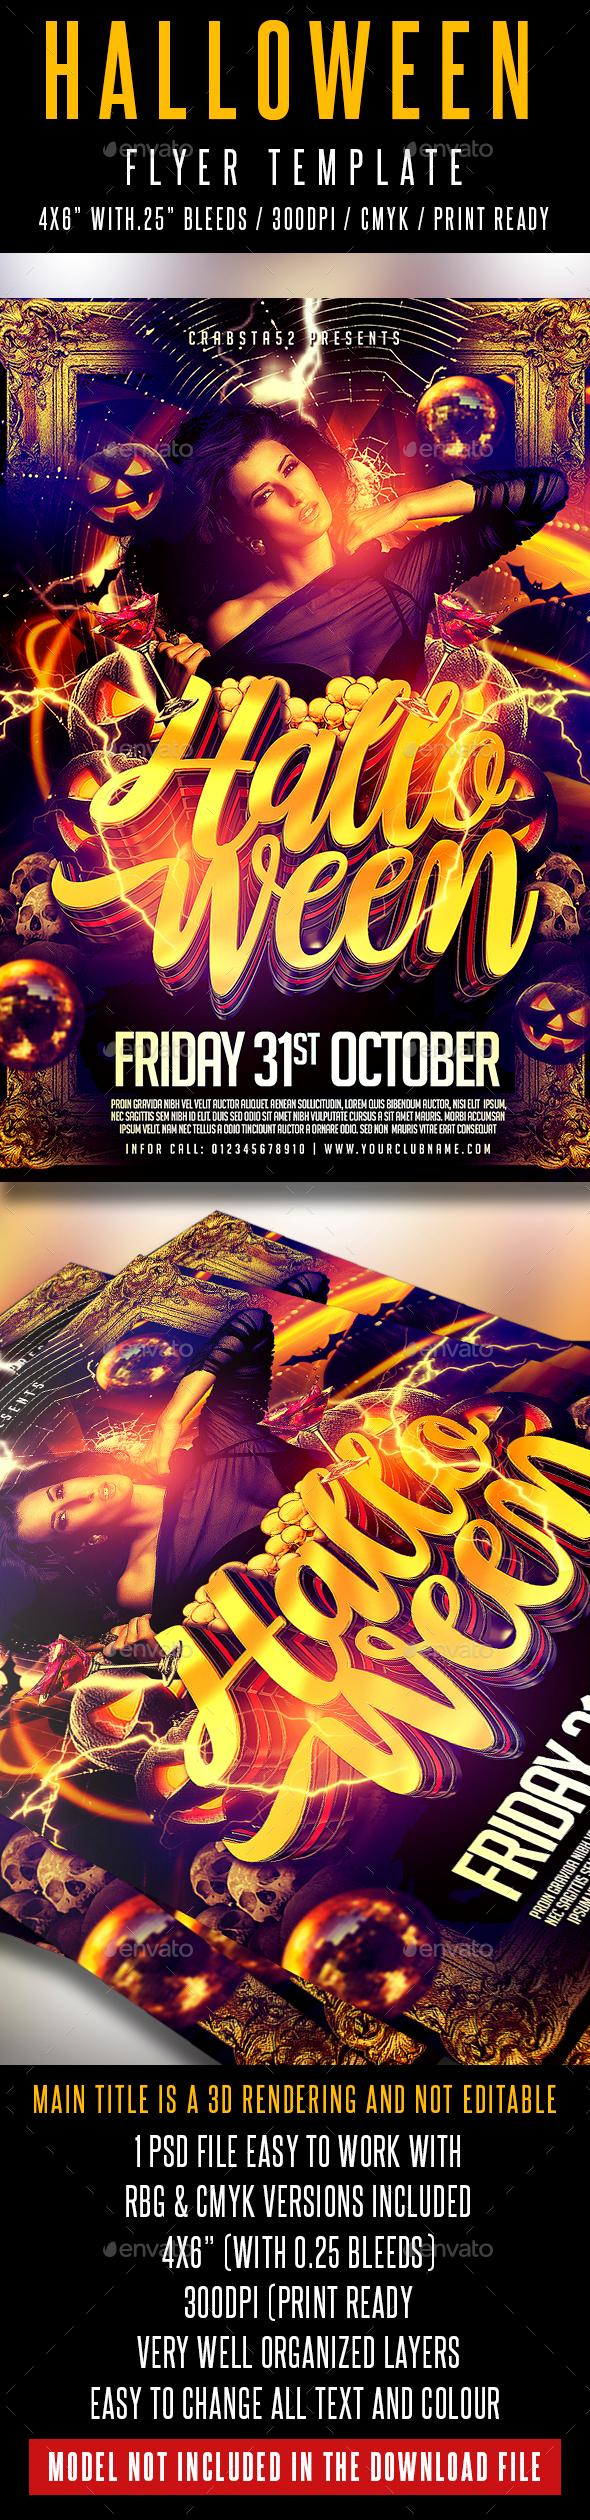 Halloween Flyer Template - Flyers Print Templates